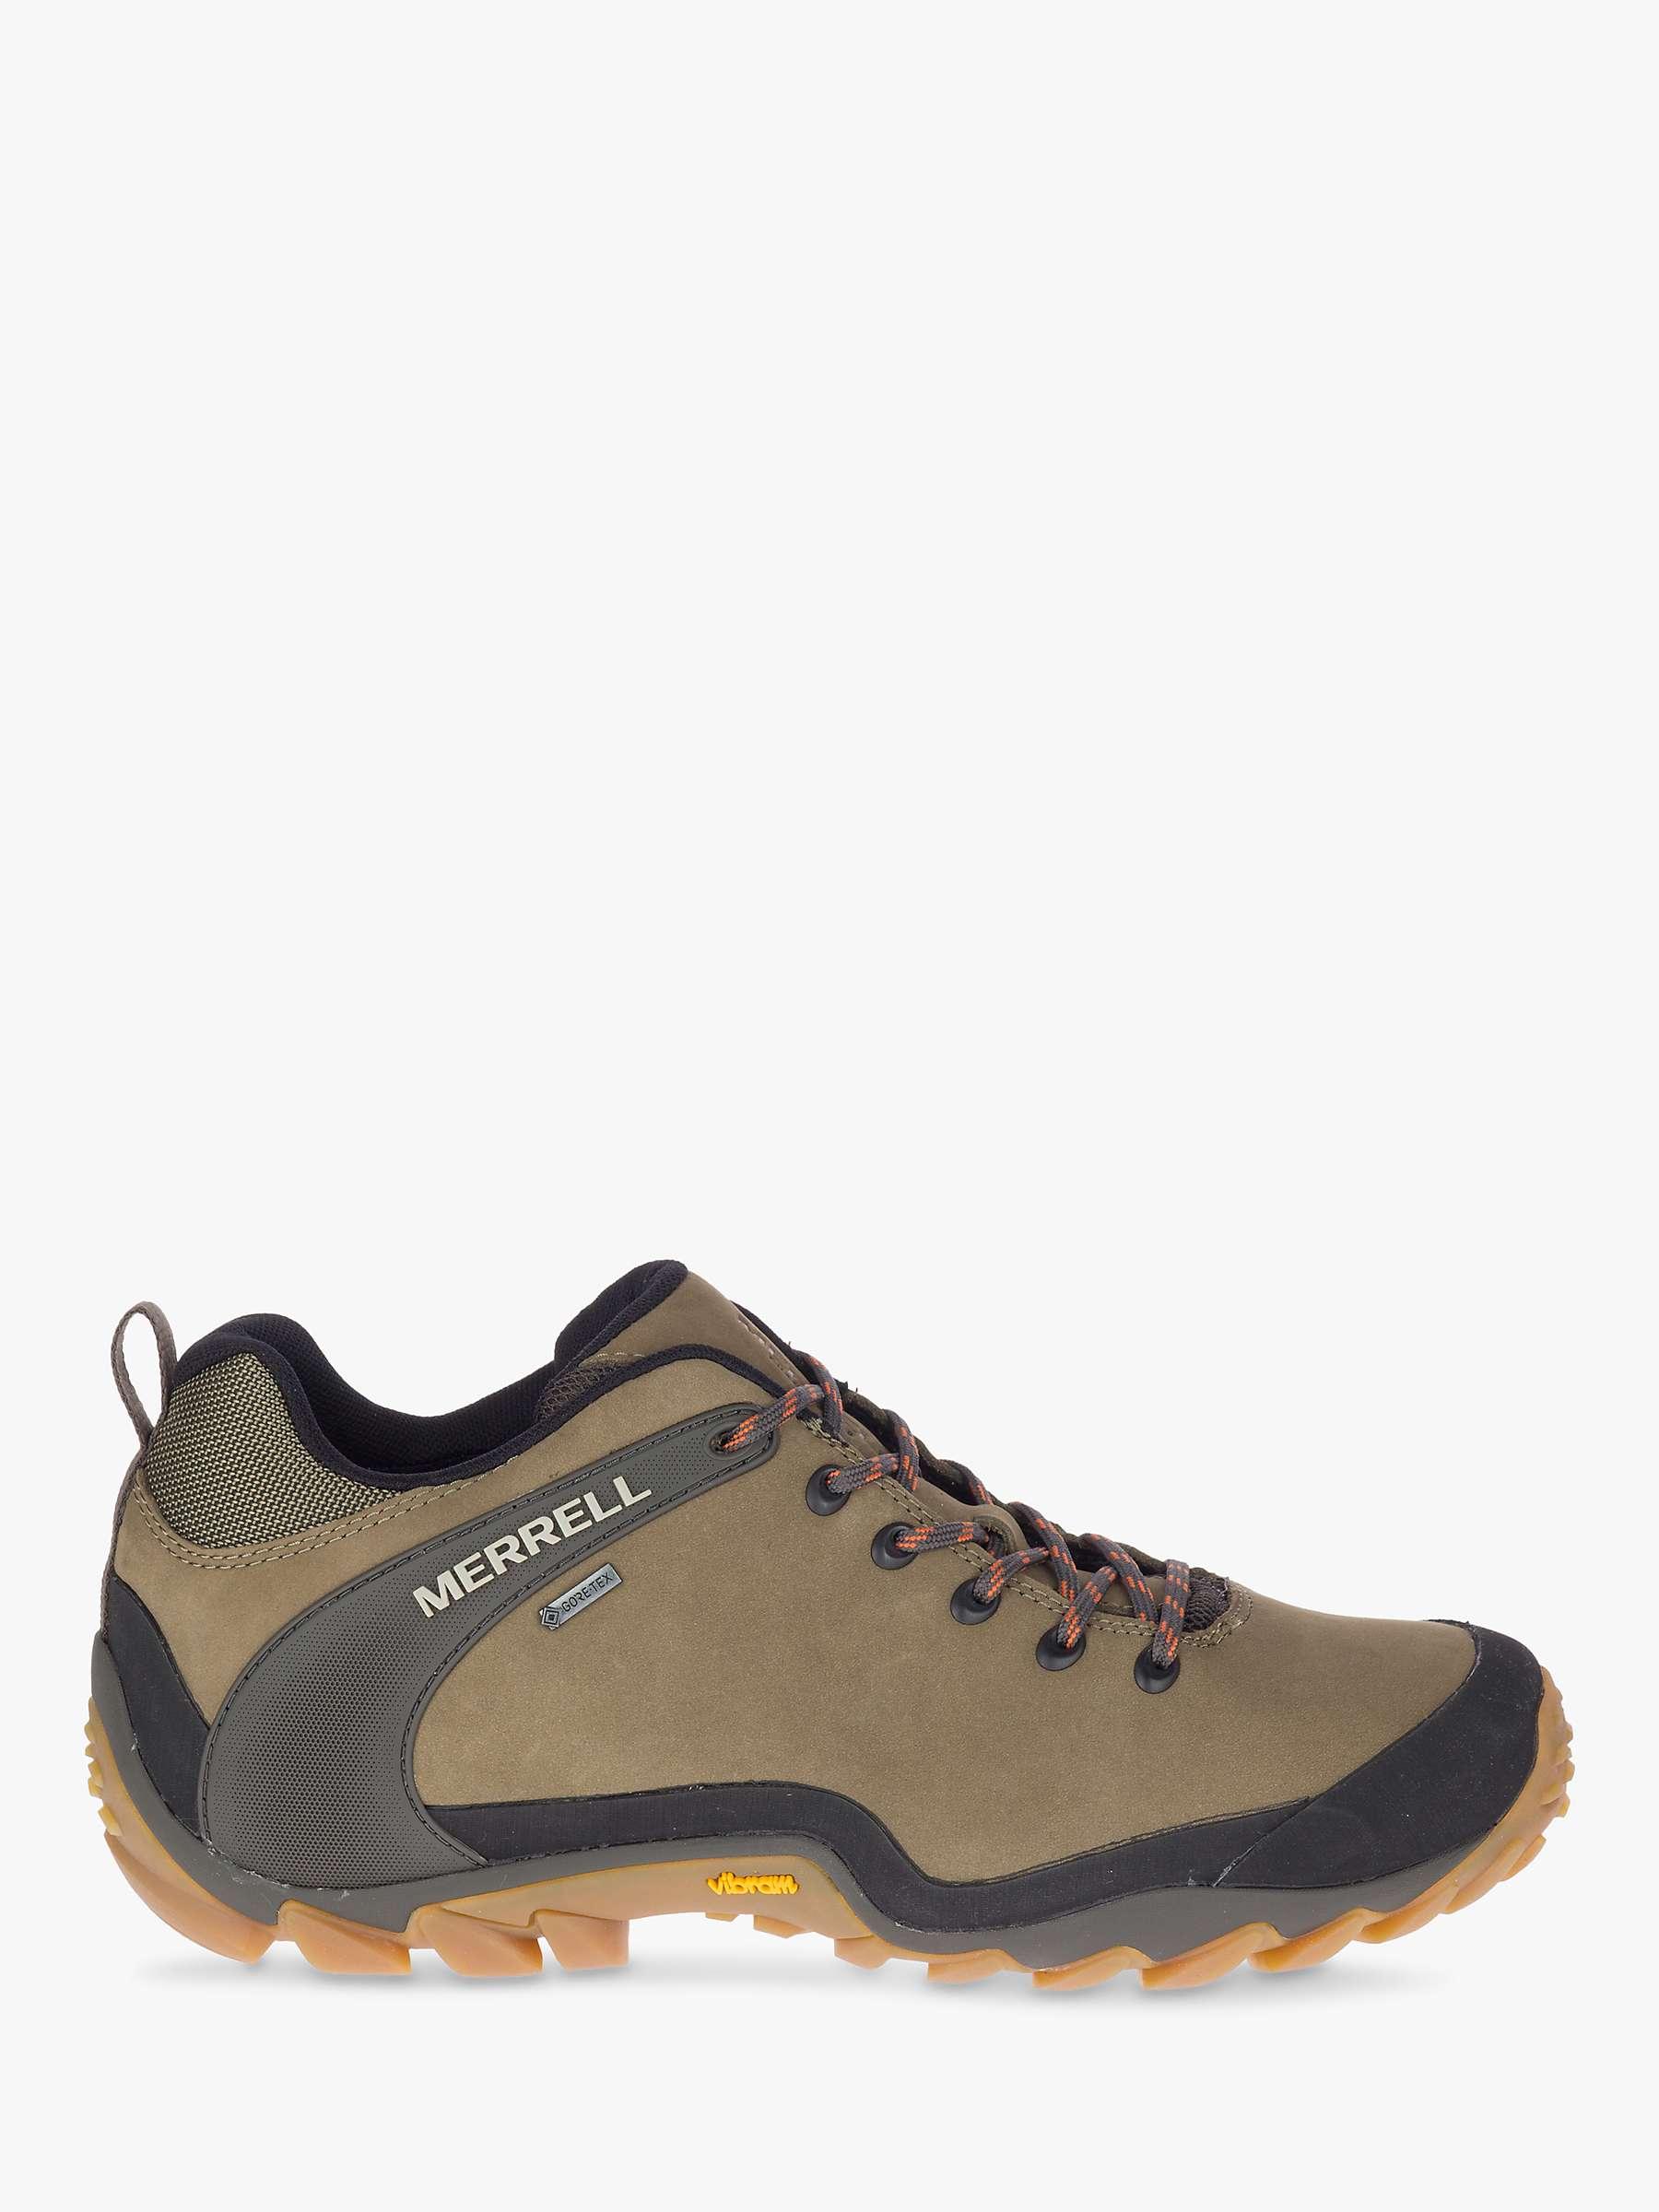 Confezione da mettere bolla compatto  Merrell Chameleon 8 Men's Waterproof Gore-Tex Walking Shoes, Olive at John  Lewis & Partners